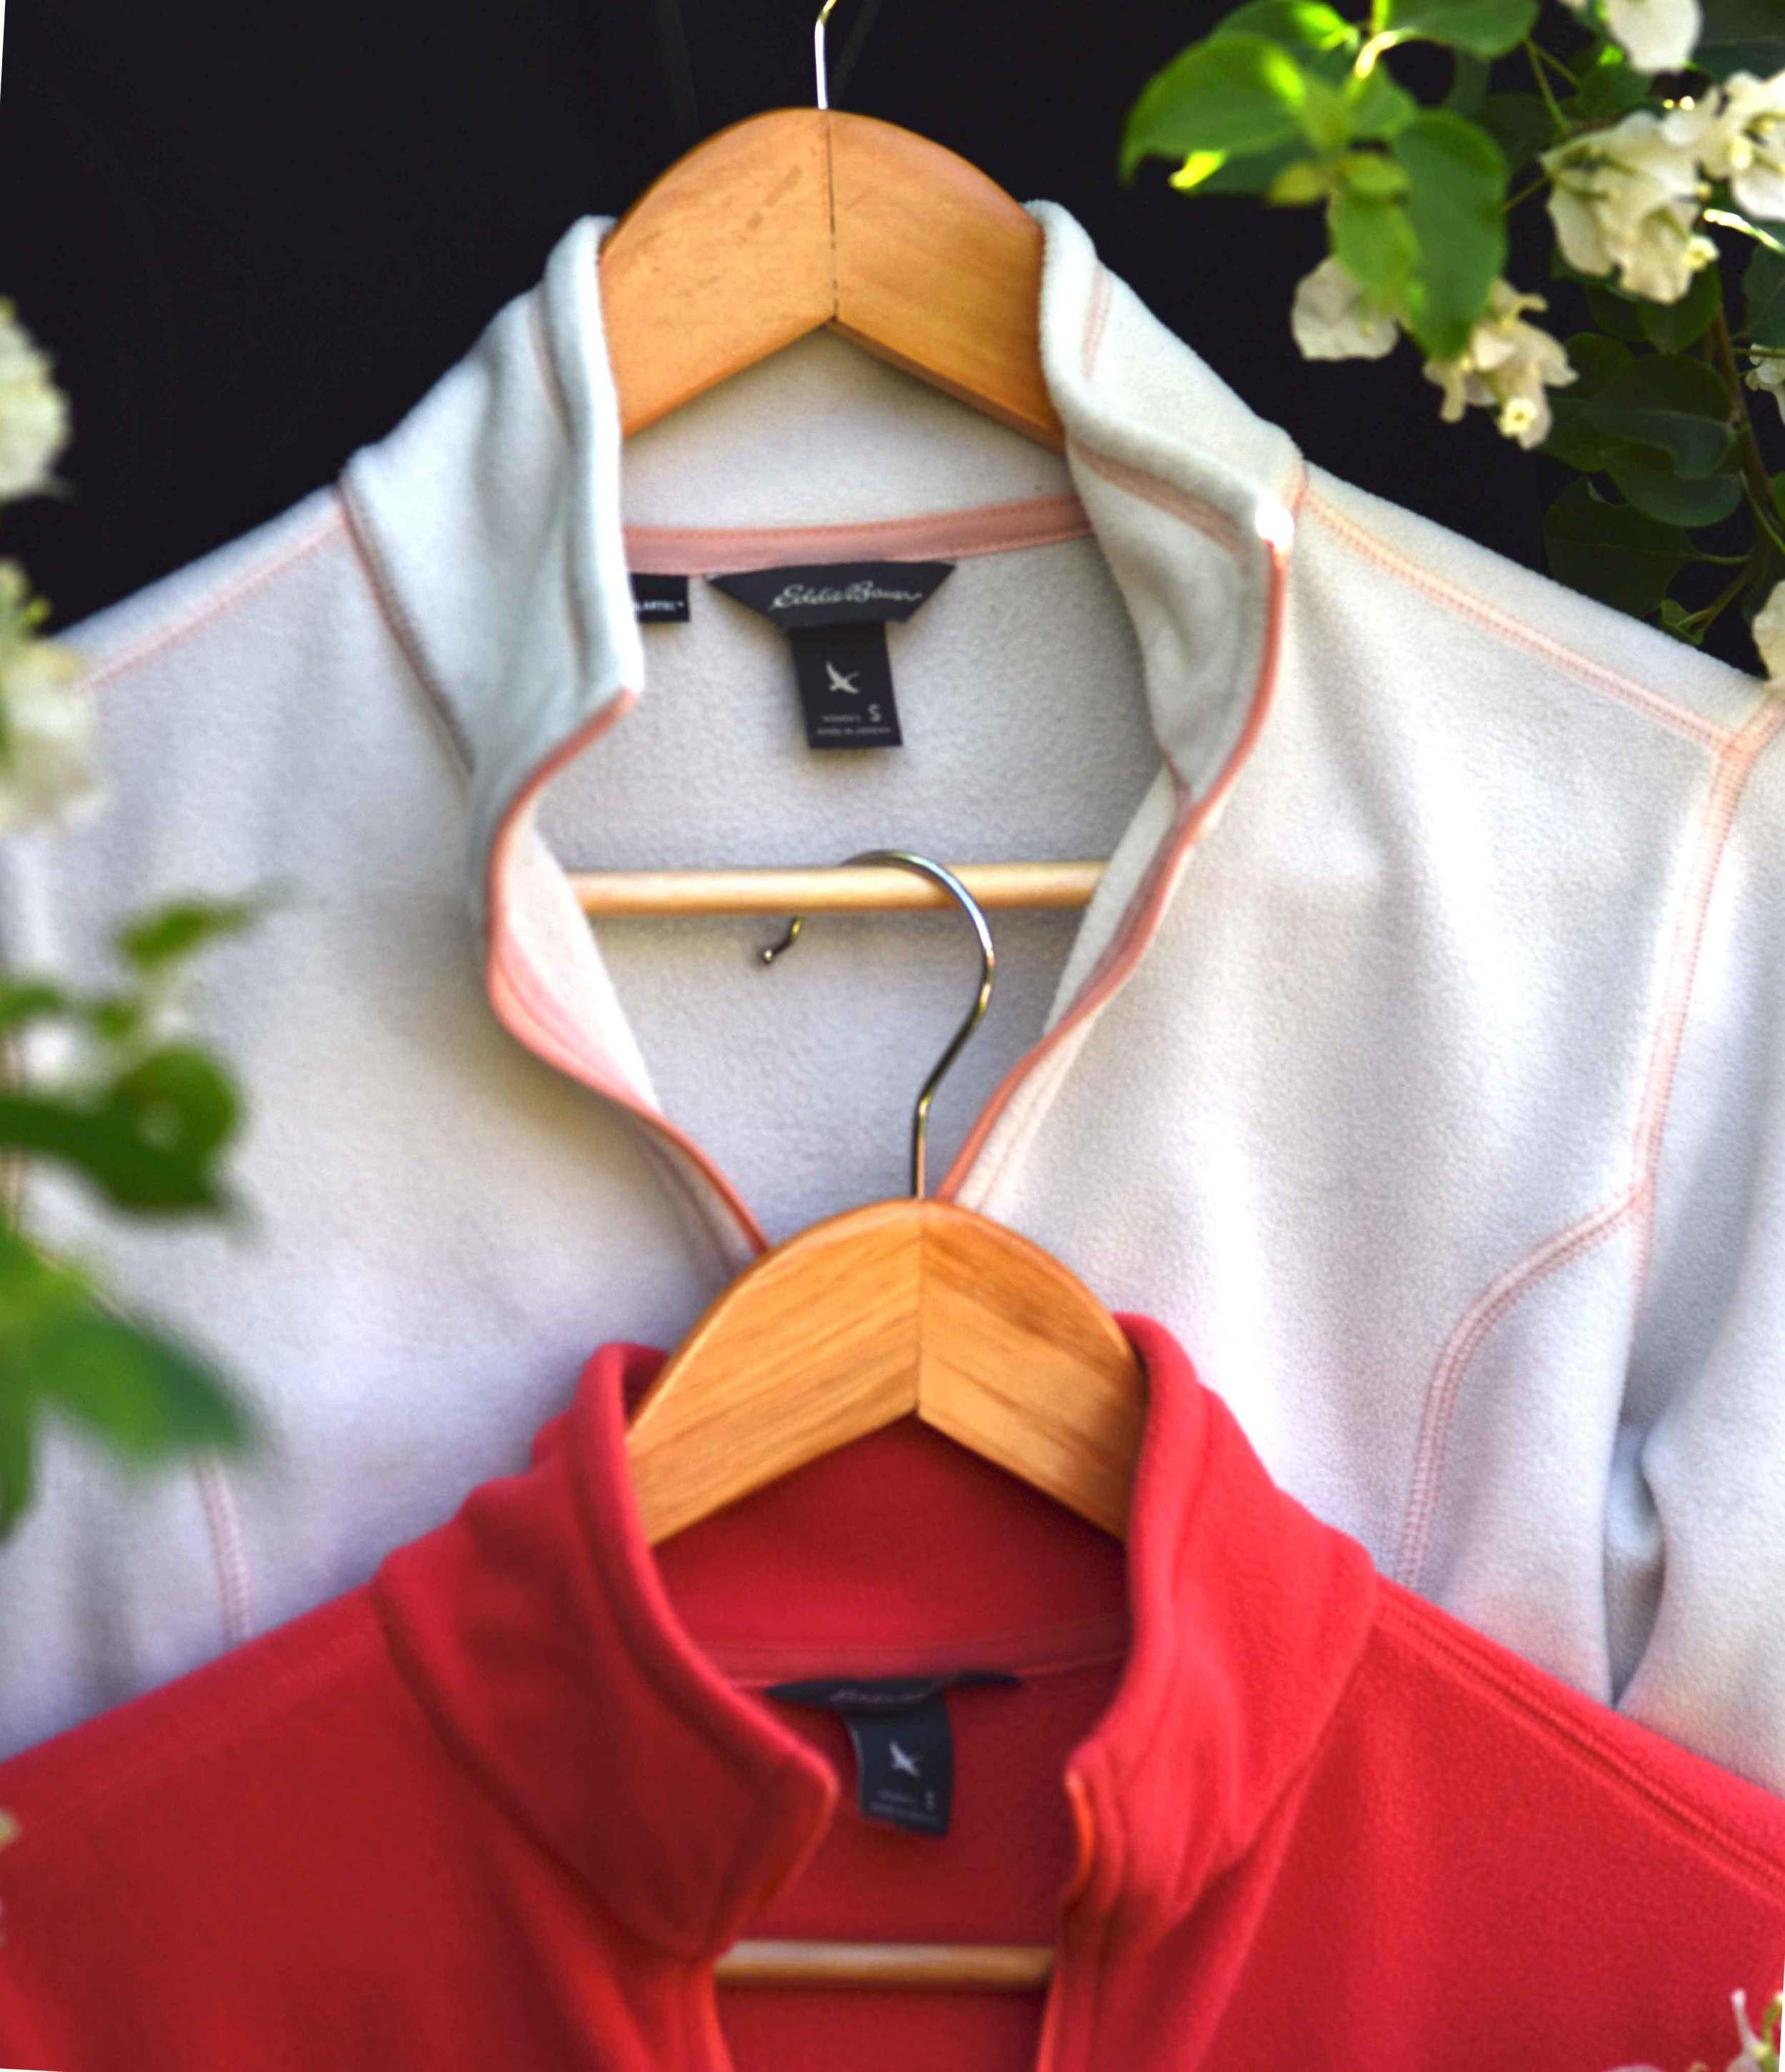 My Eddie Bauer Quest 150 Fleece Jackets, image©gunjanvirk